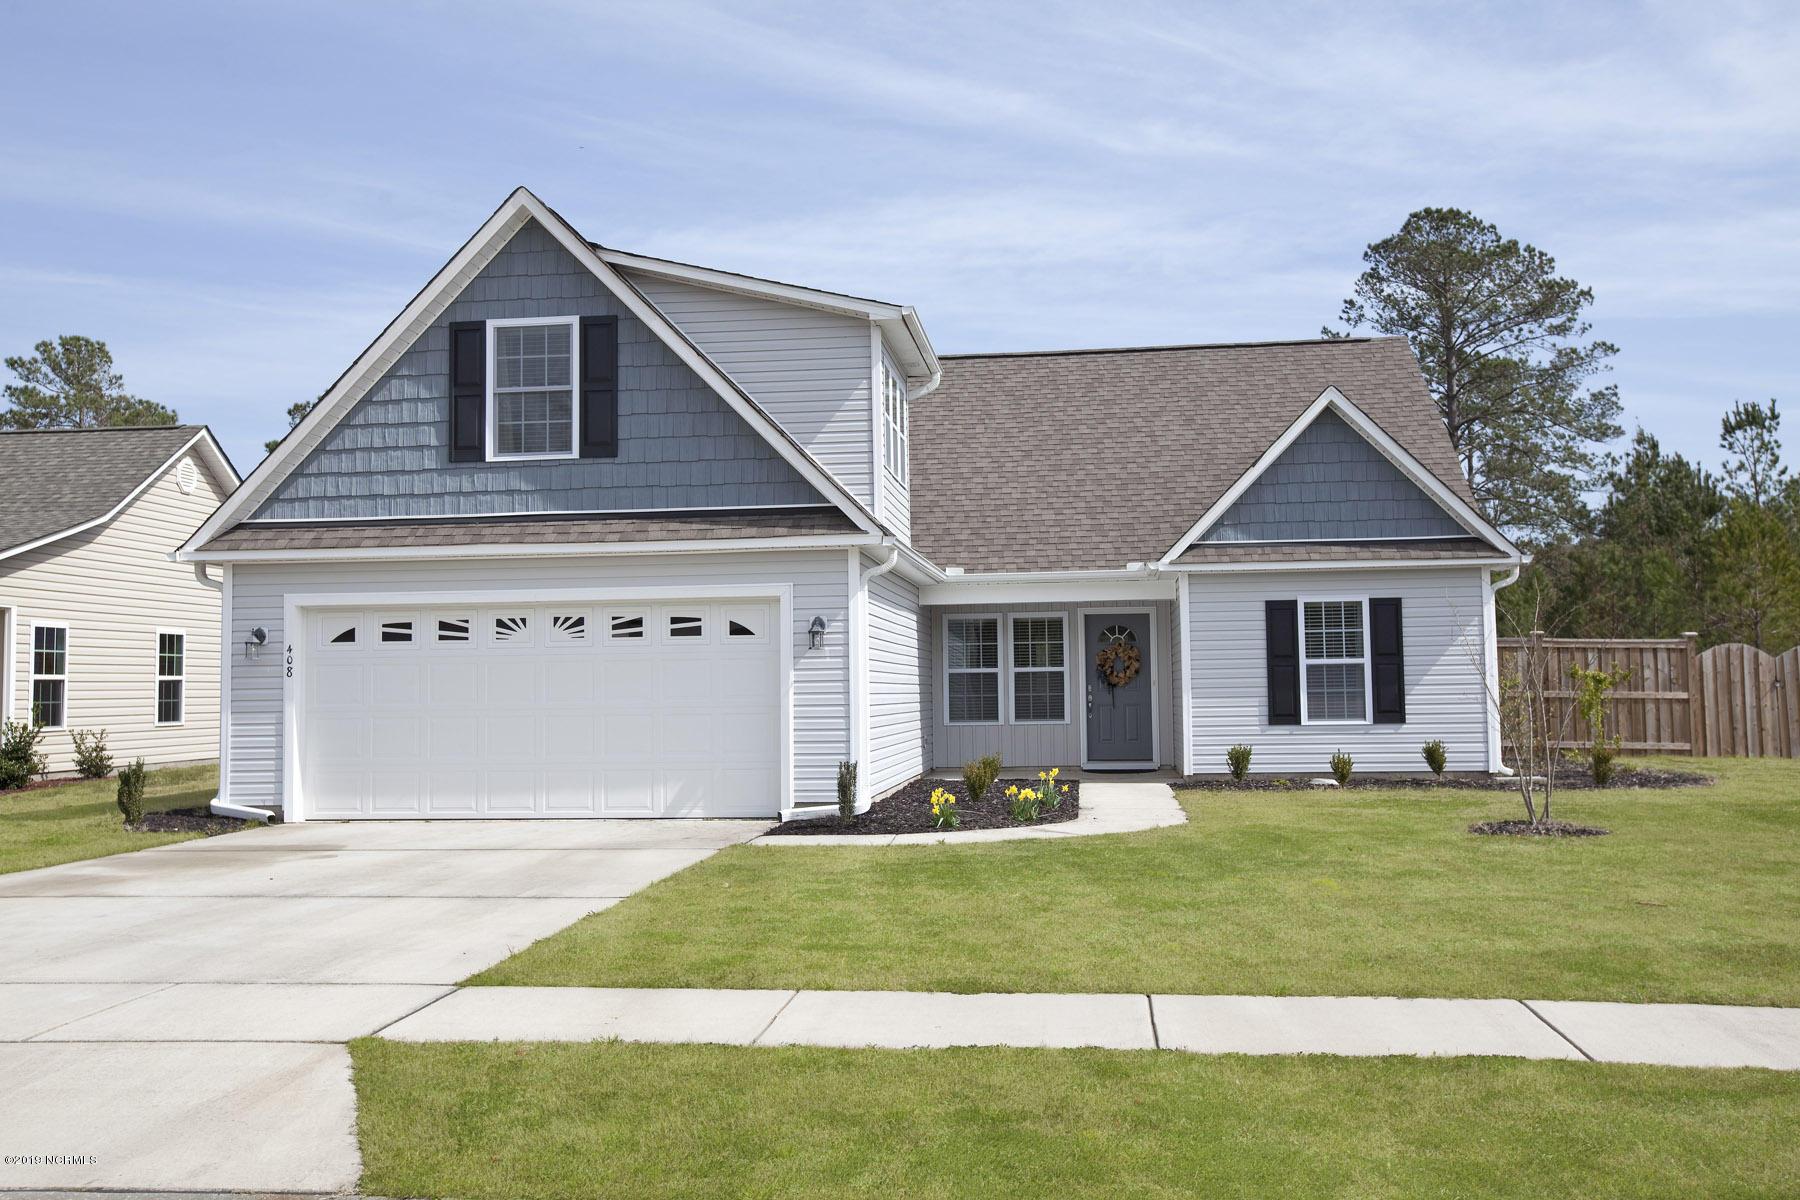 408 Culverton Road, Winnabow, North Carolina, 4 Bedrooms Bedrooms, 9 Rooms Rooms,3 BathroomsBathrooms,Single family residence,For sale,Culverton,100155285